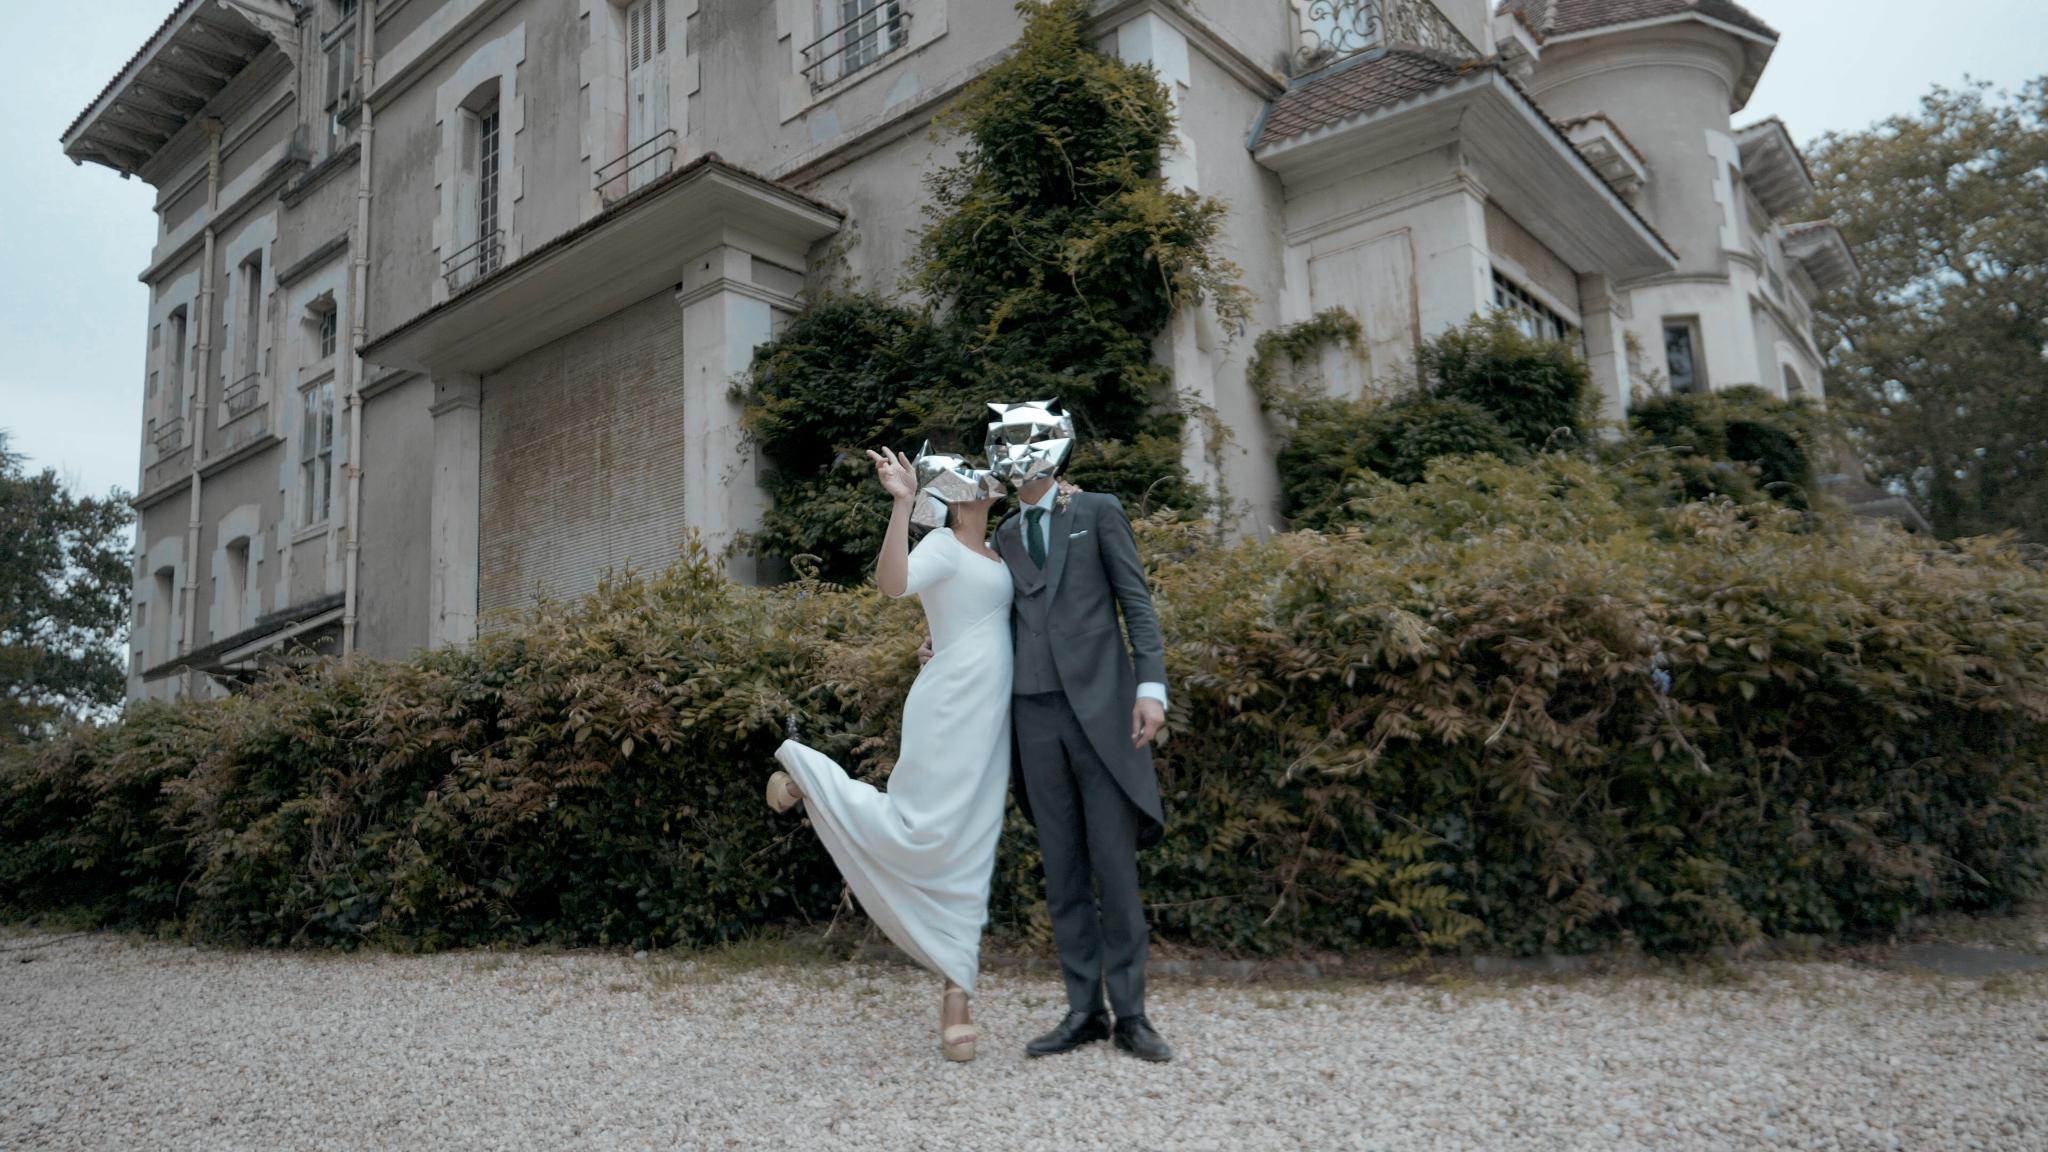 La boda de Kike y Gabriela en Donostia-San Sebastián, Guipúzcoa